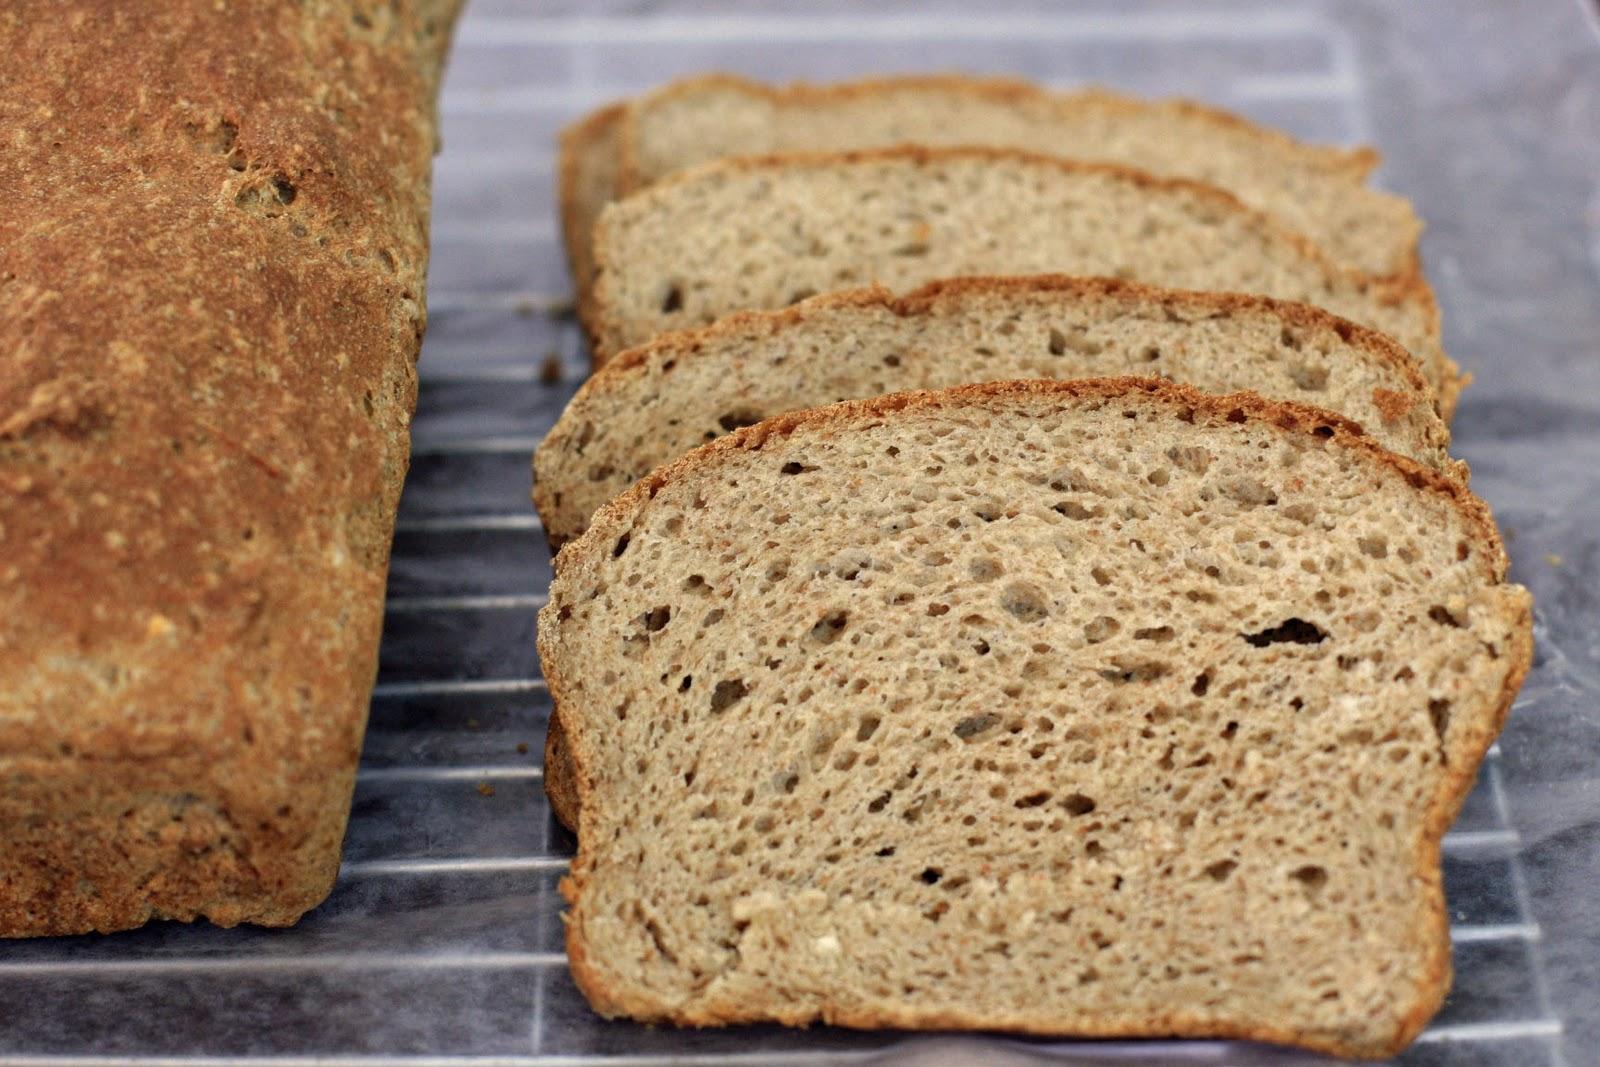 Brown Sandwich Bread with Teff, Gluten-Free   Girl Cooks World